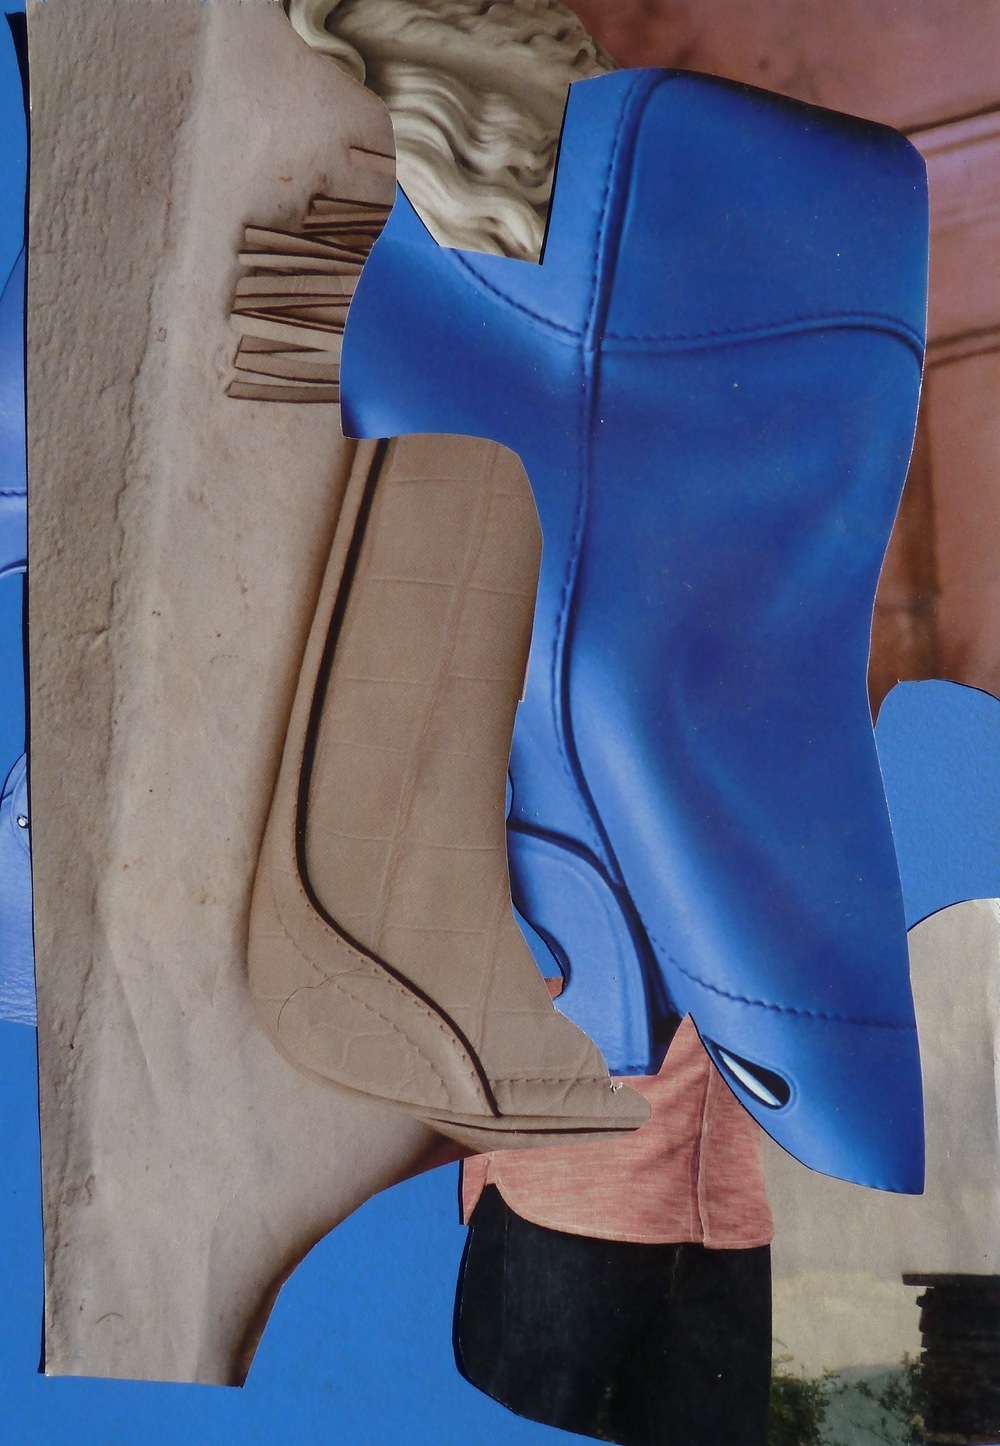 Blue Boy, 2015, Collage, 10 x 7 in.